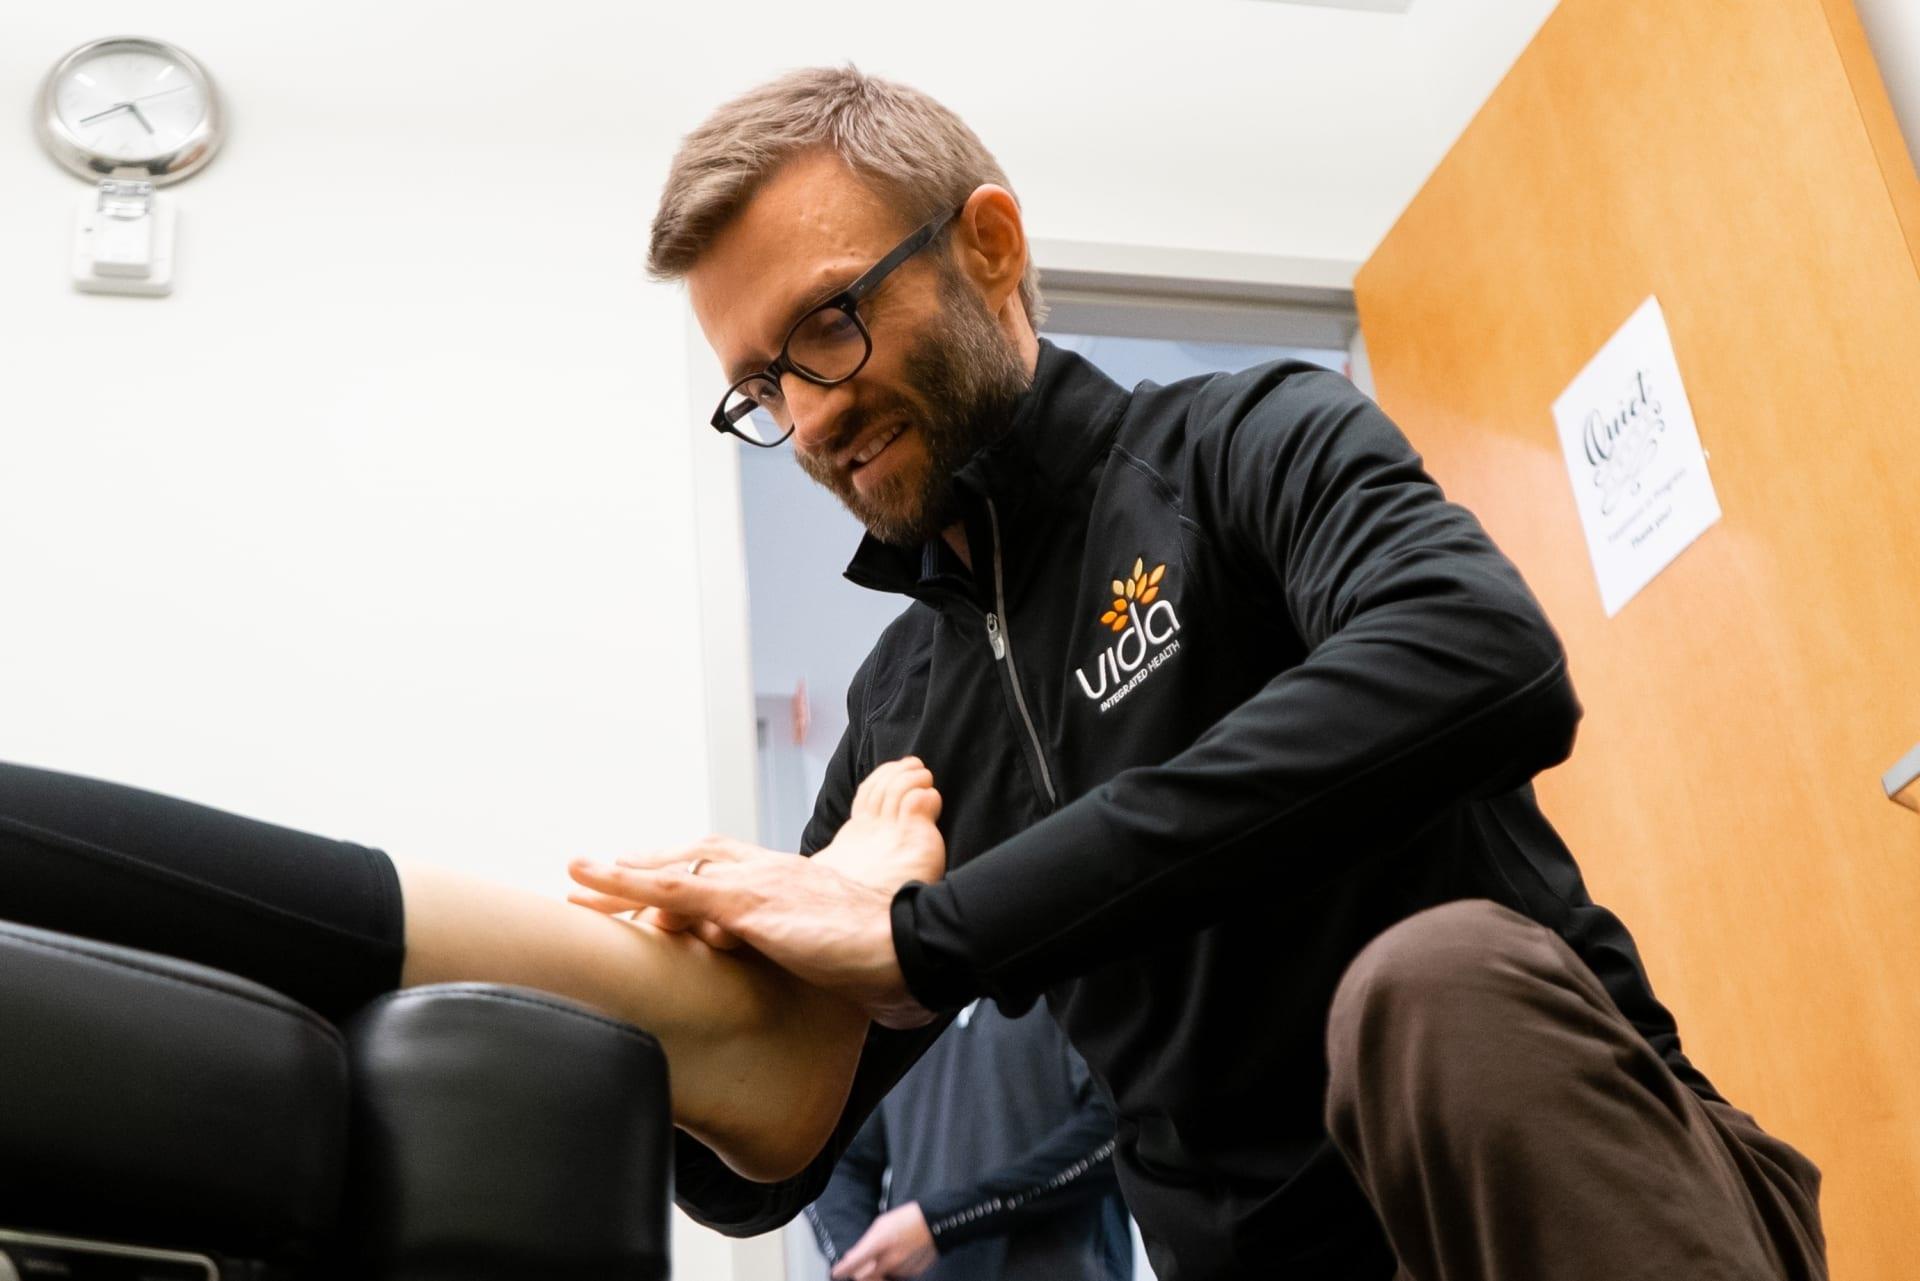 Chiropractic Care with Dr Ryan Culp Vida Everett